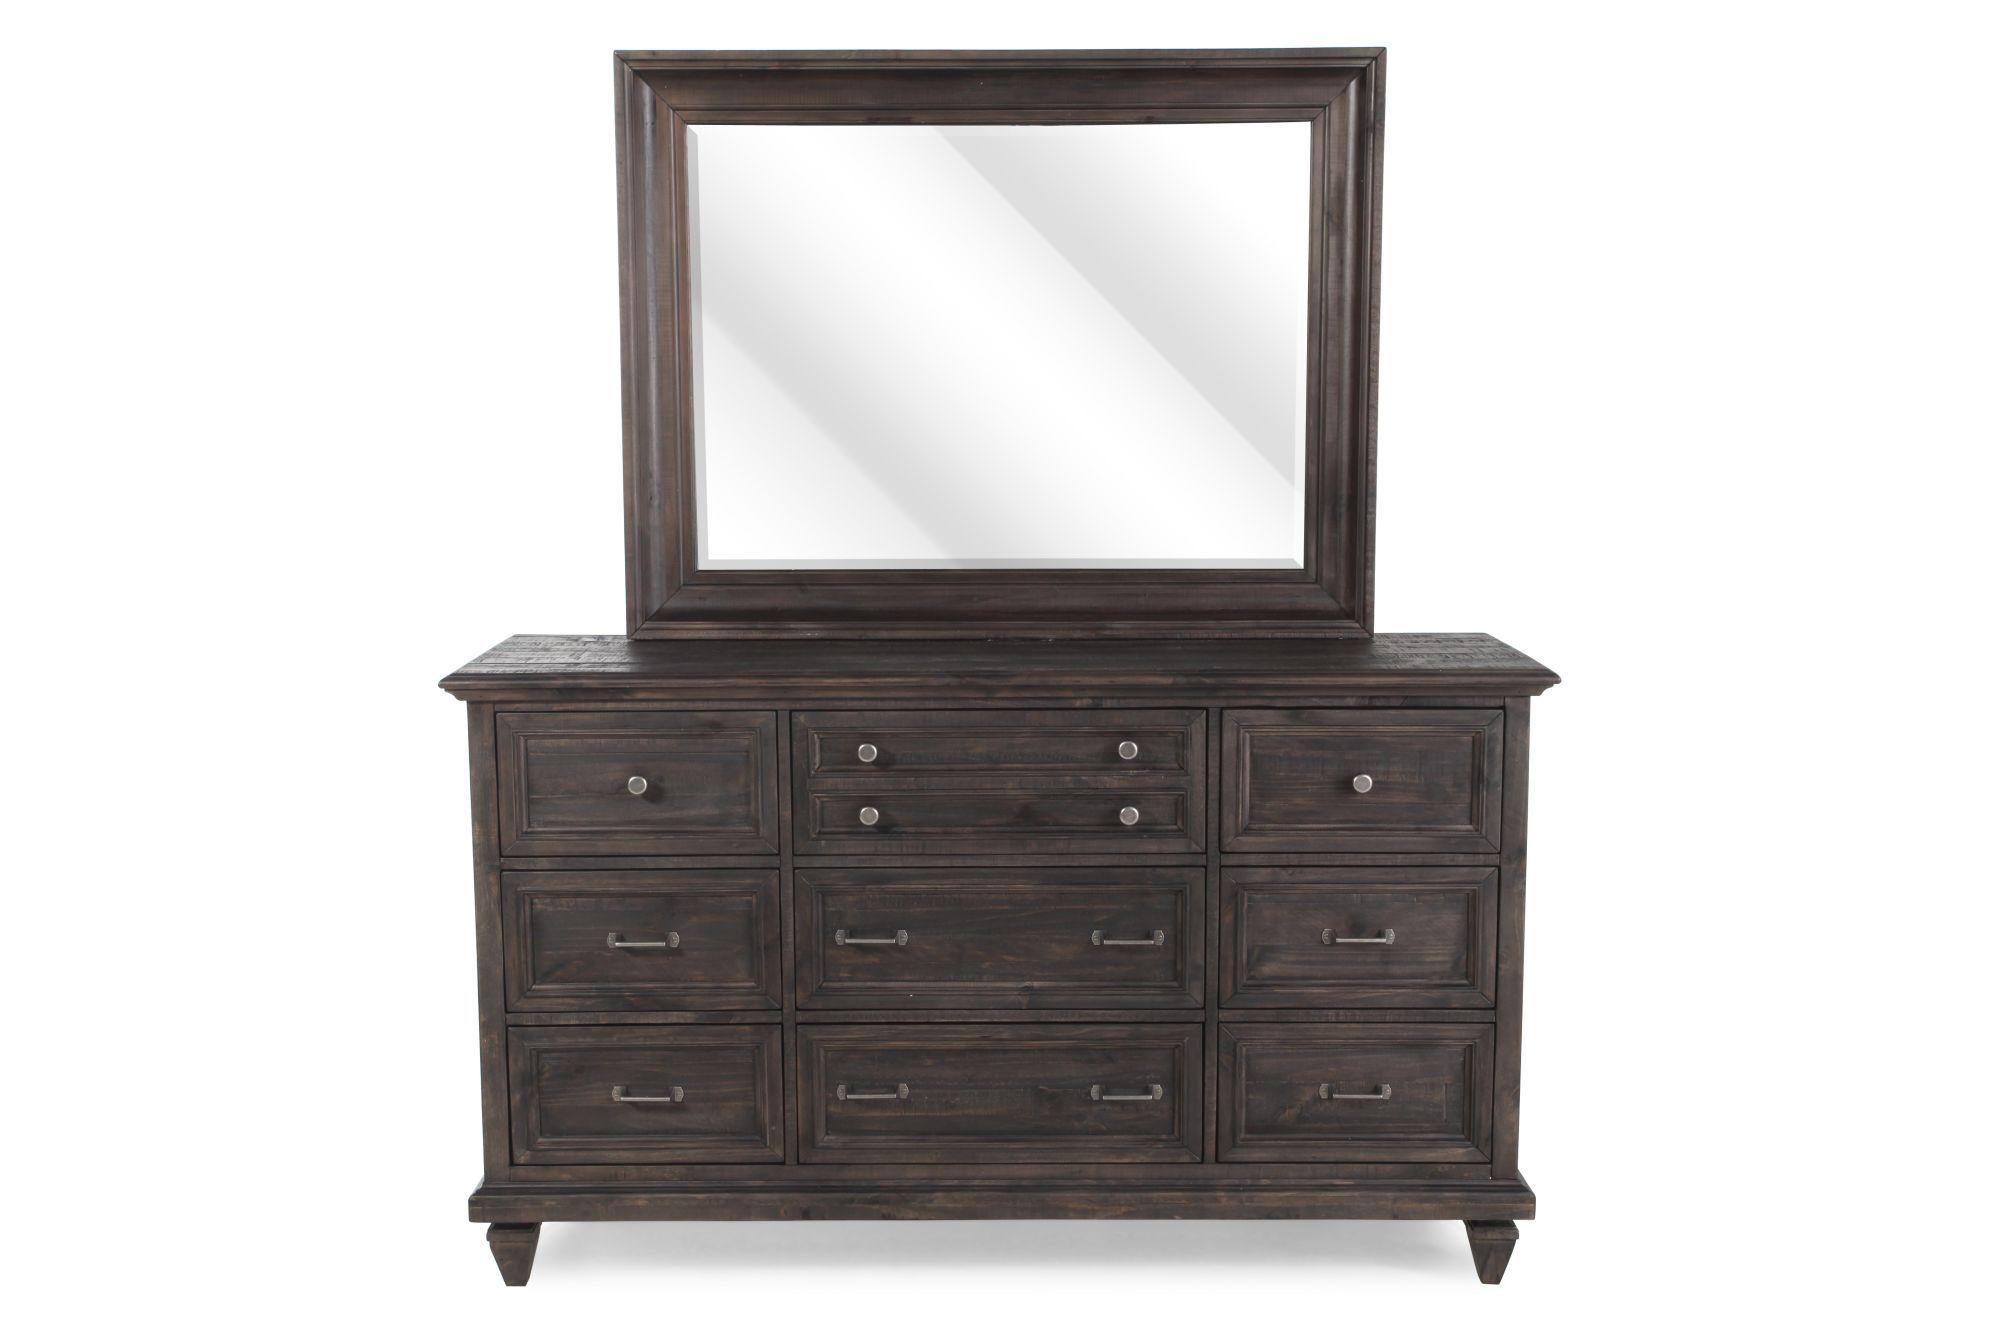 magnussen home calistoga dresser and mirror - Magnussen Furniture